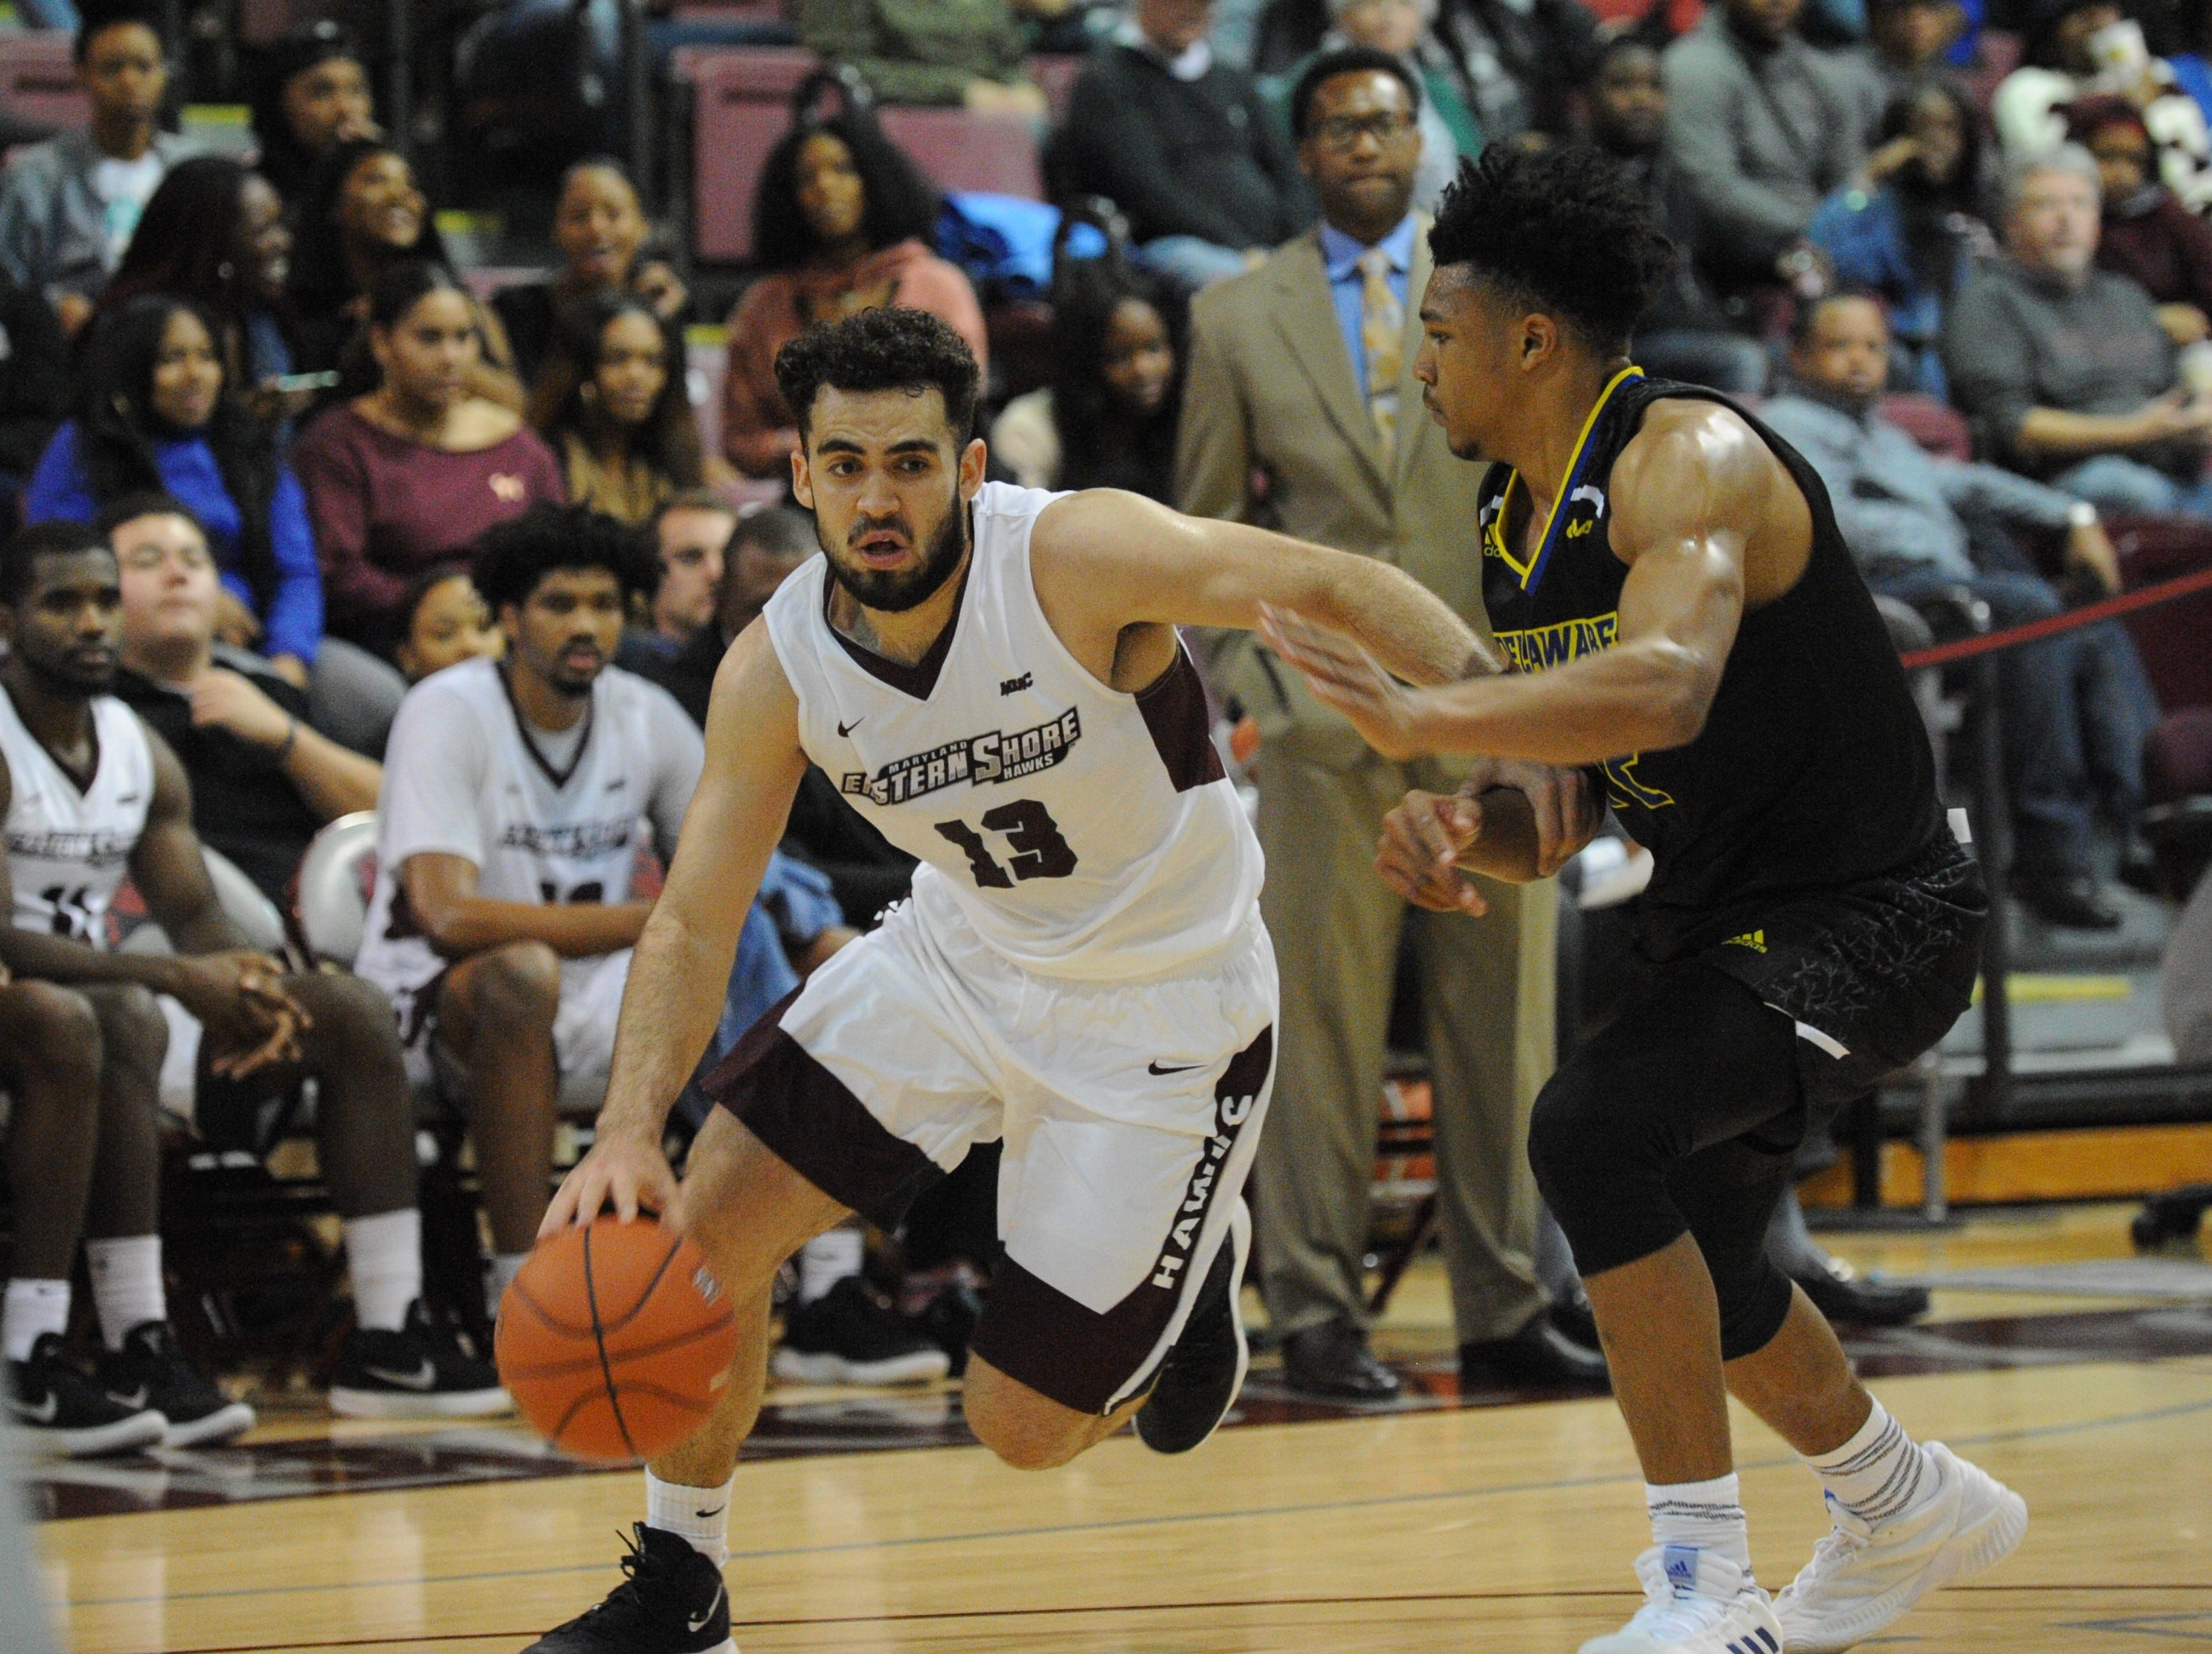 University of Maryland Eastern Shore guard Bryan Urrutia dribbles down the lane against the University of Delaware on Friday, Nov. 30, 2018. The Blue Hens beat the Hawks, 71-62.